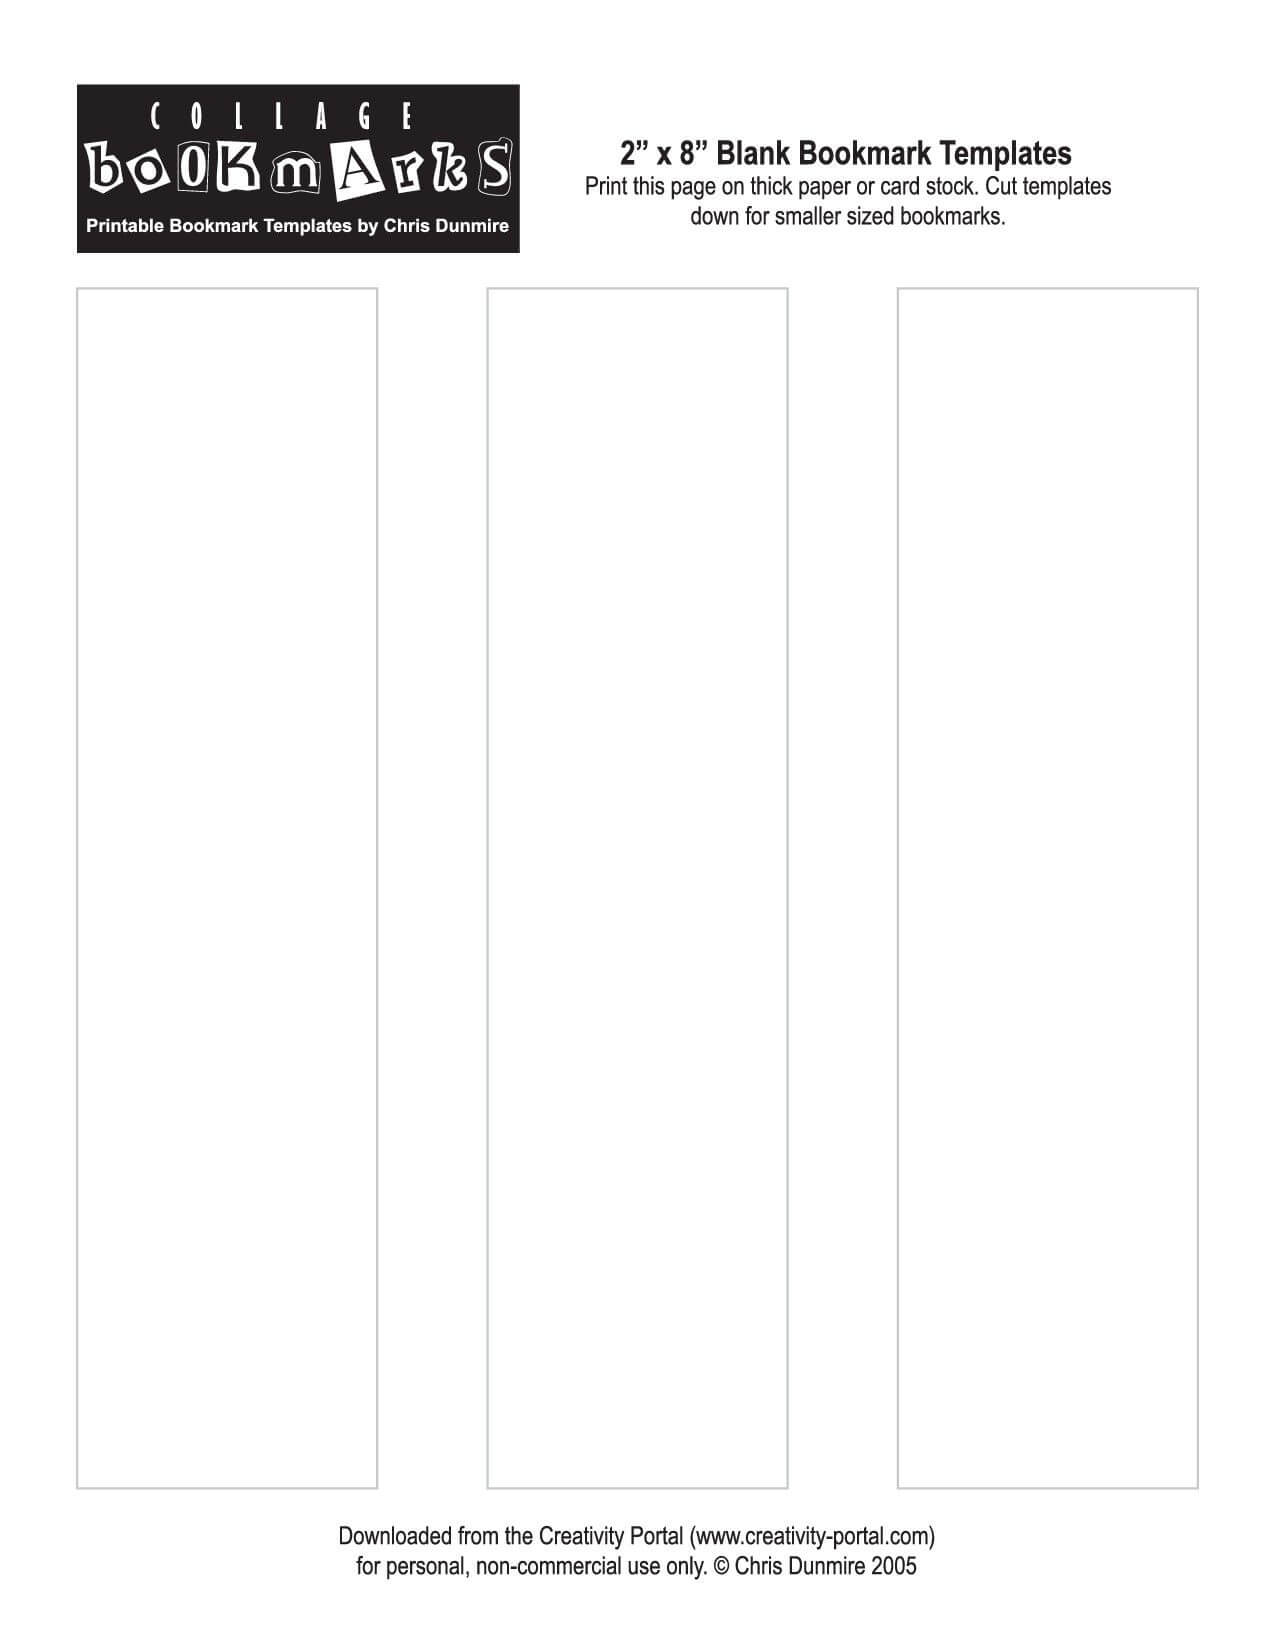 Blank Bookmark Template Printable   Literacy   Bookmark With Regard To Free Blank Bookmark Templates To Print